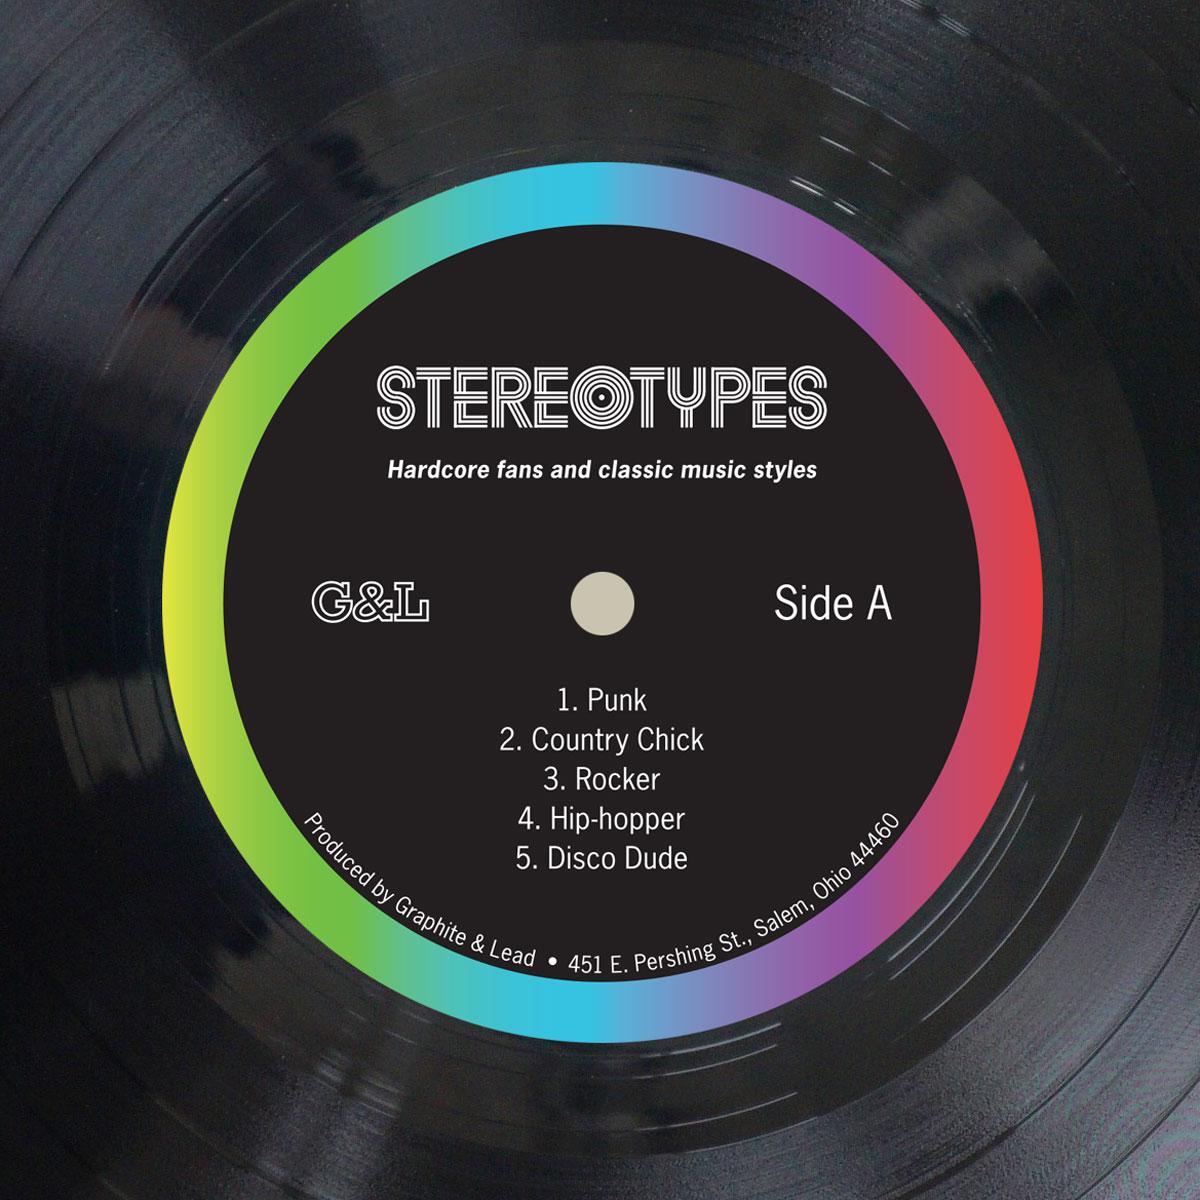 Label-On-Record.jpg